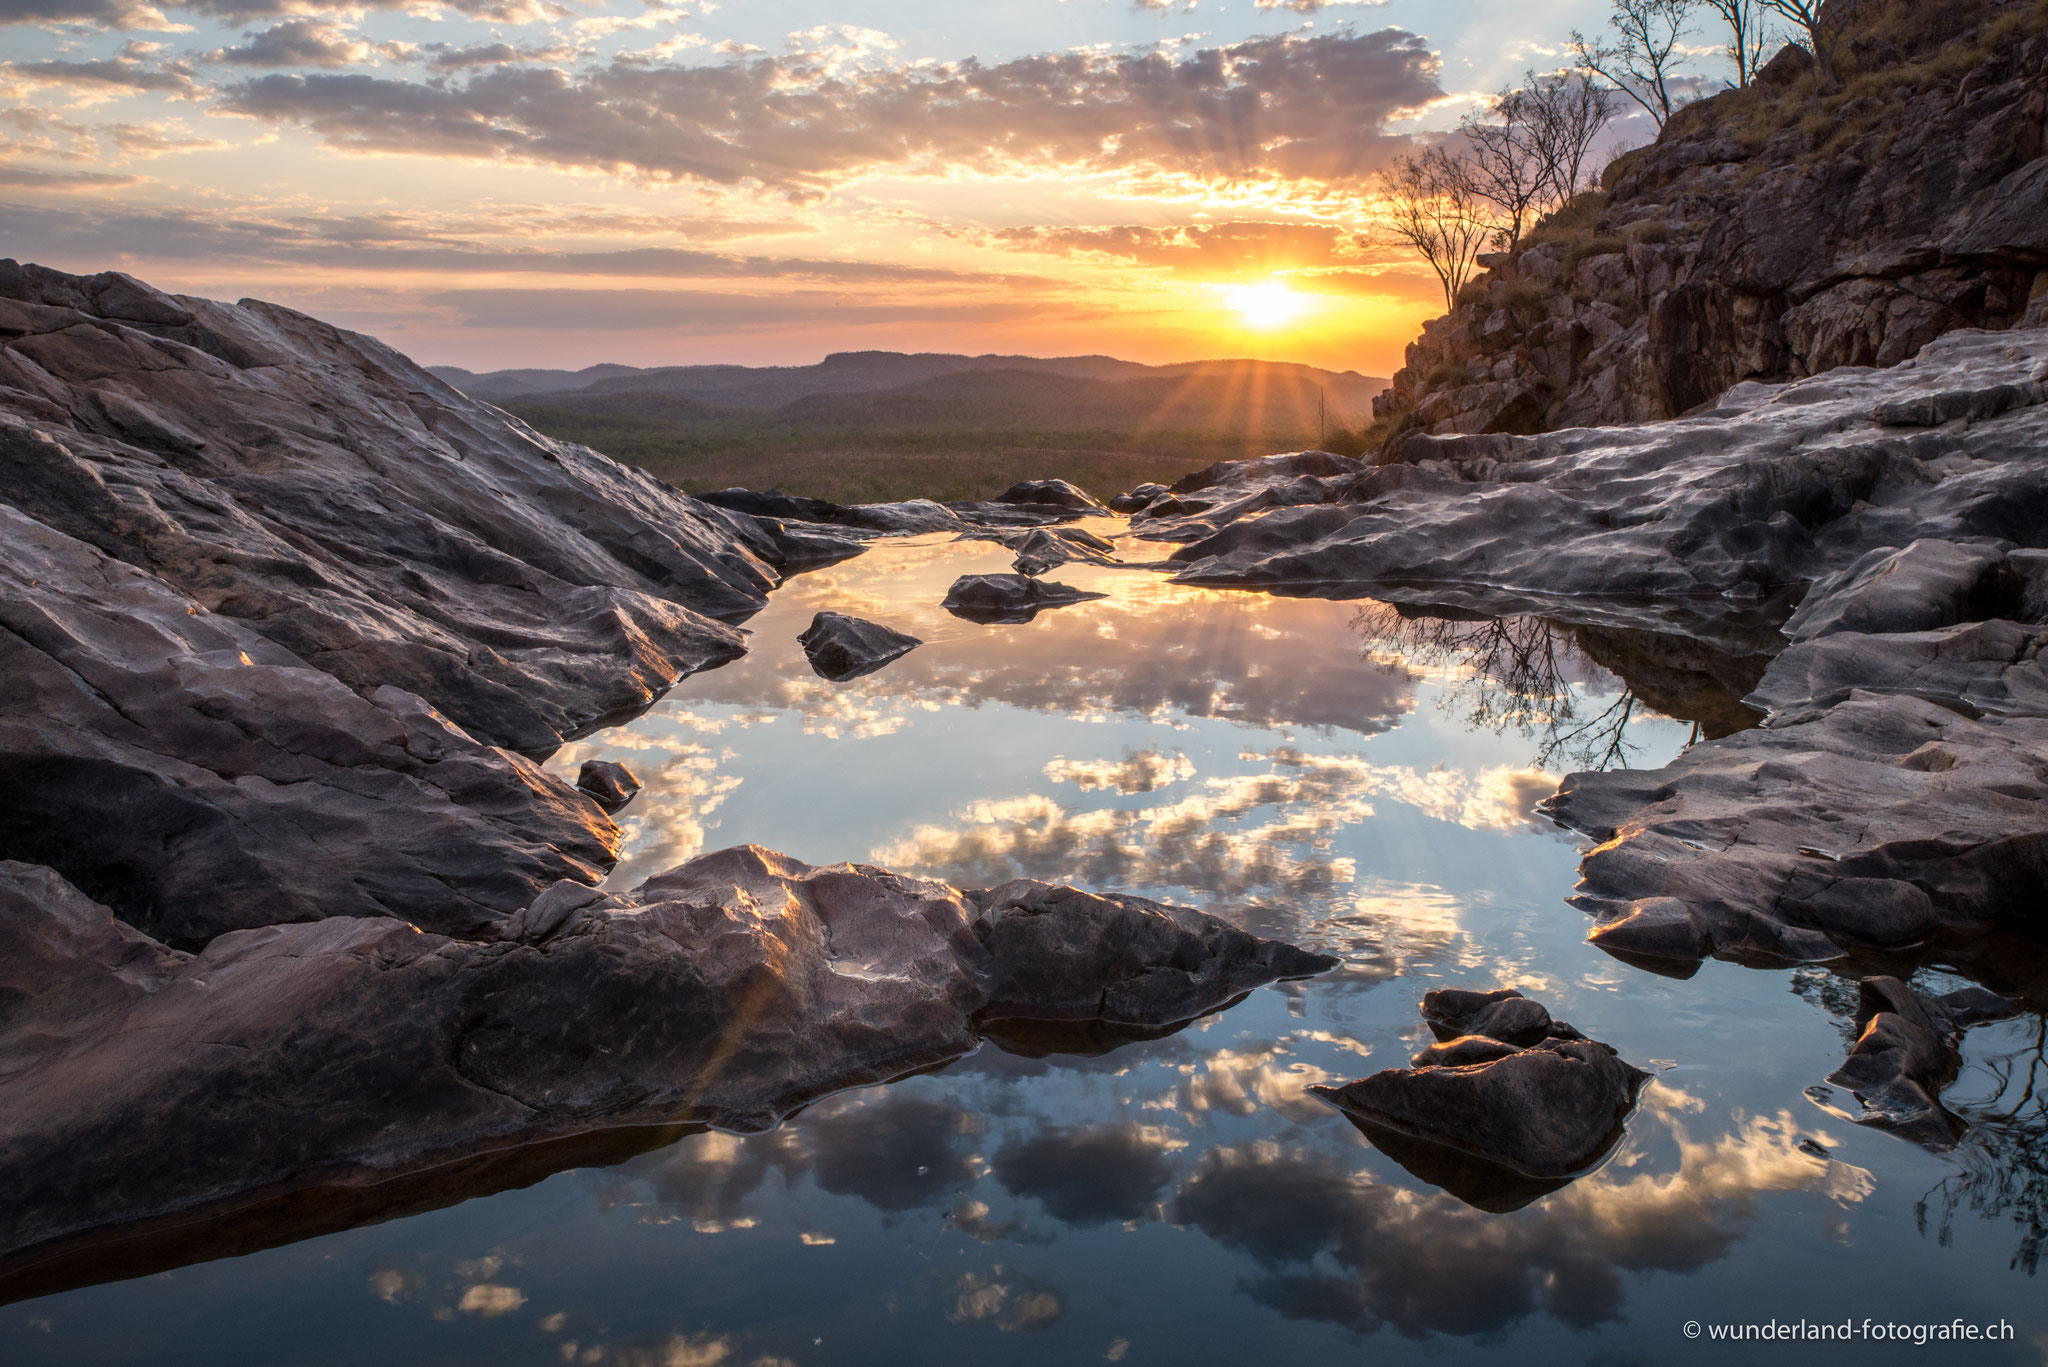 Infinity-Pool bei Gunlom (Kakadu NP)